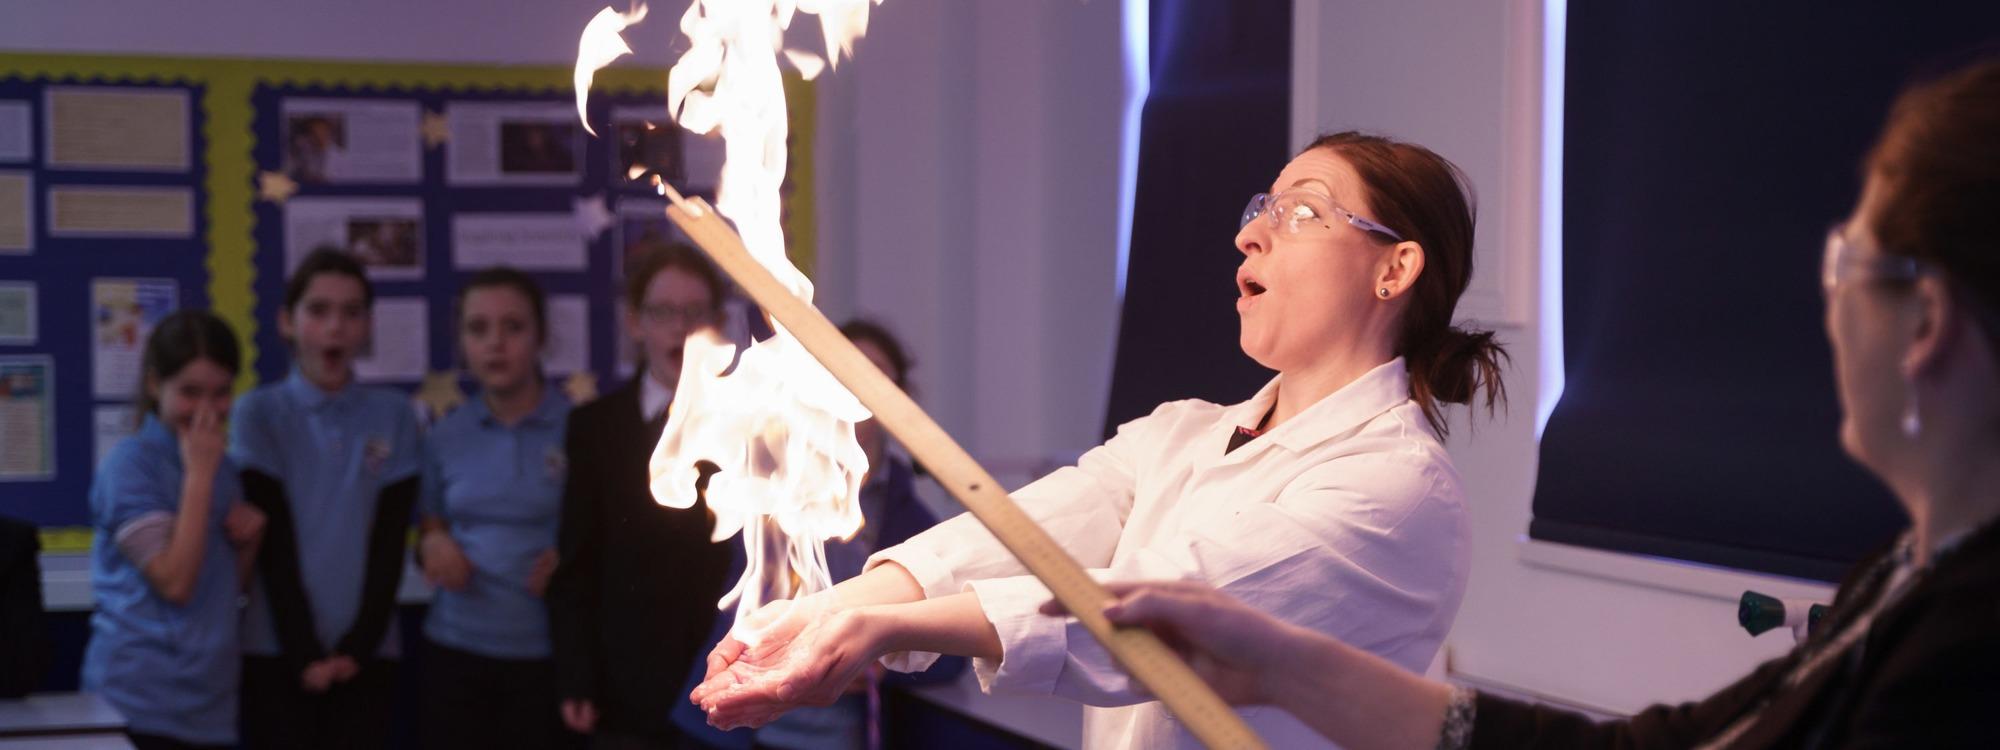 Science fire (4)